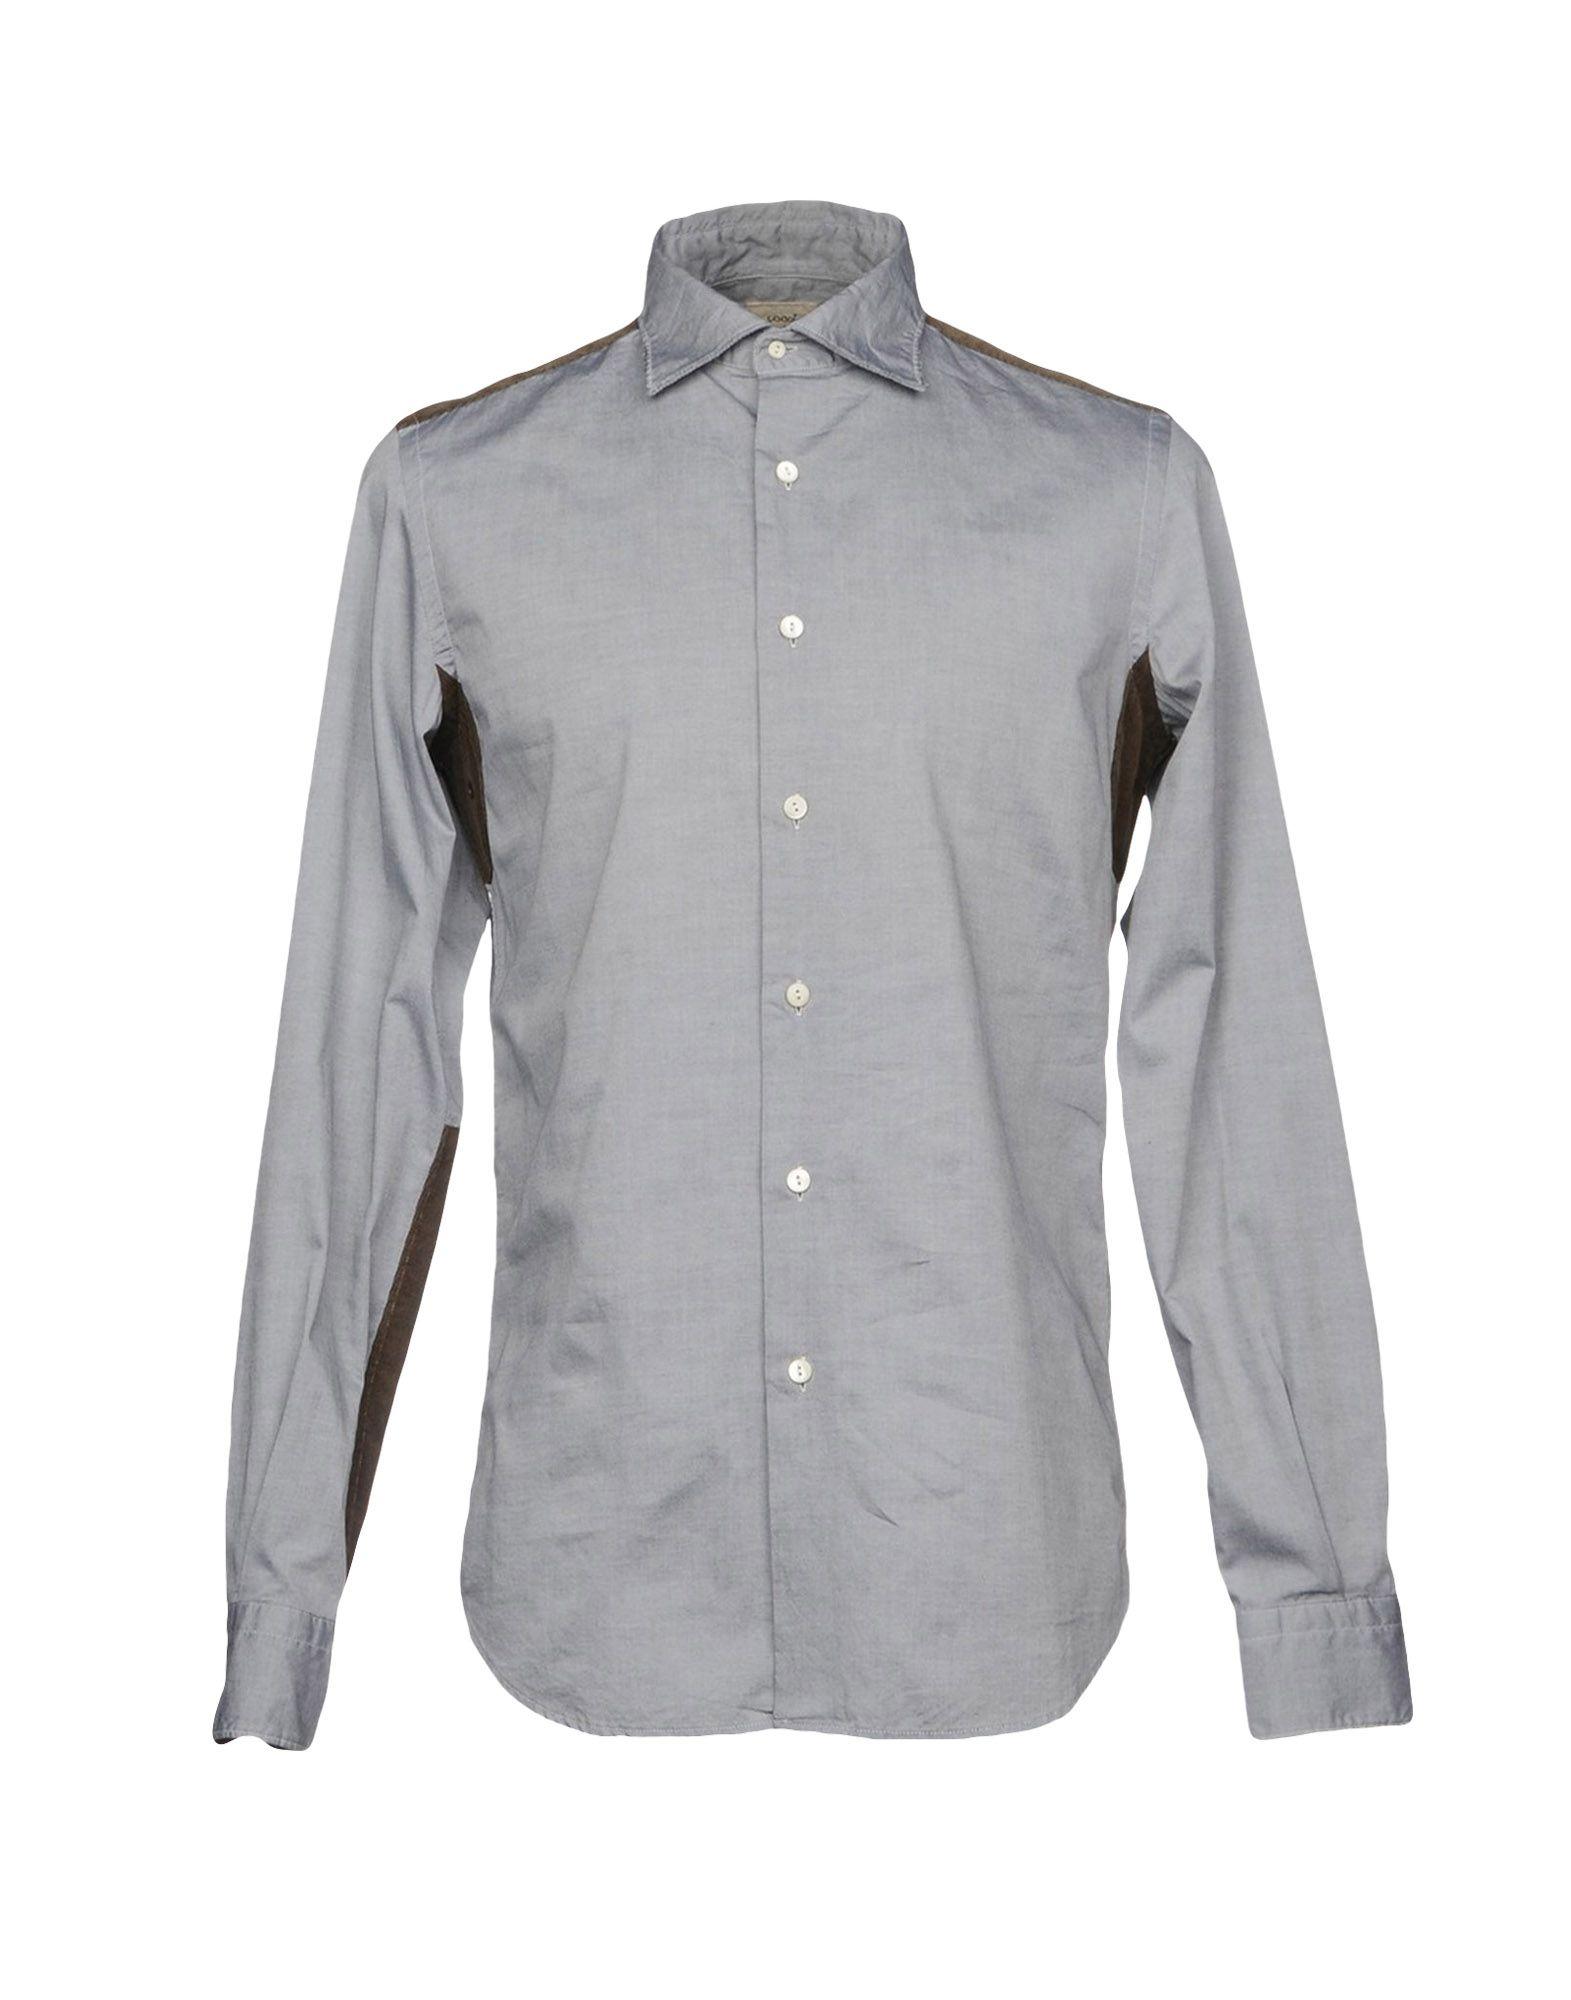 COAST WEBER & AHAUS Pубашка блузка coast weber